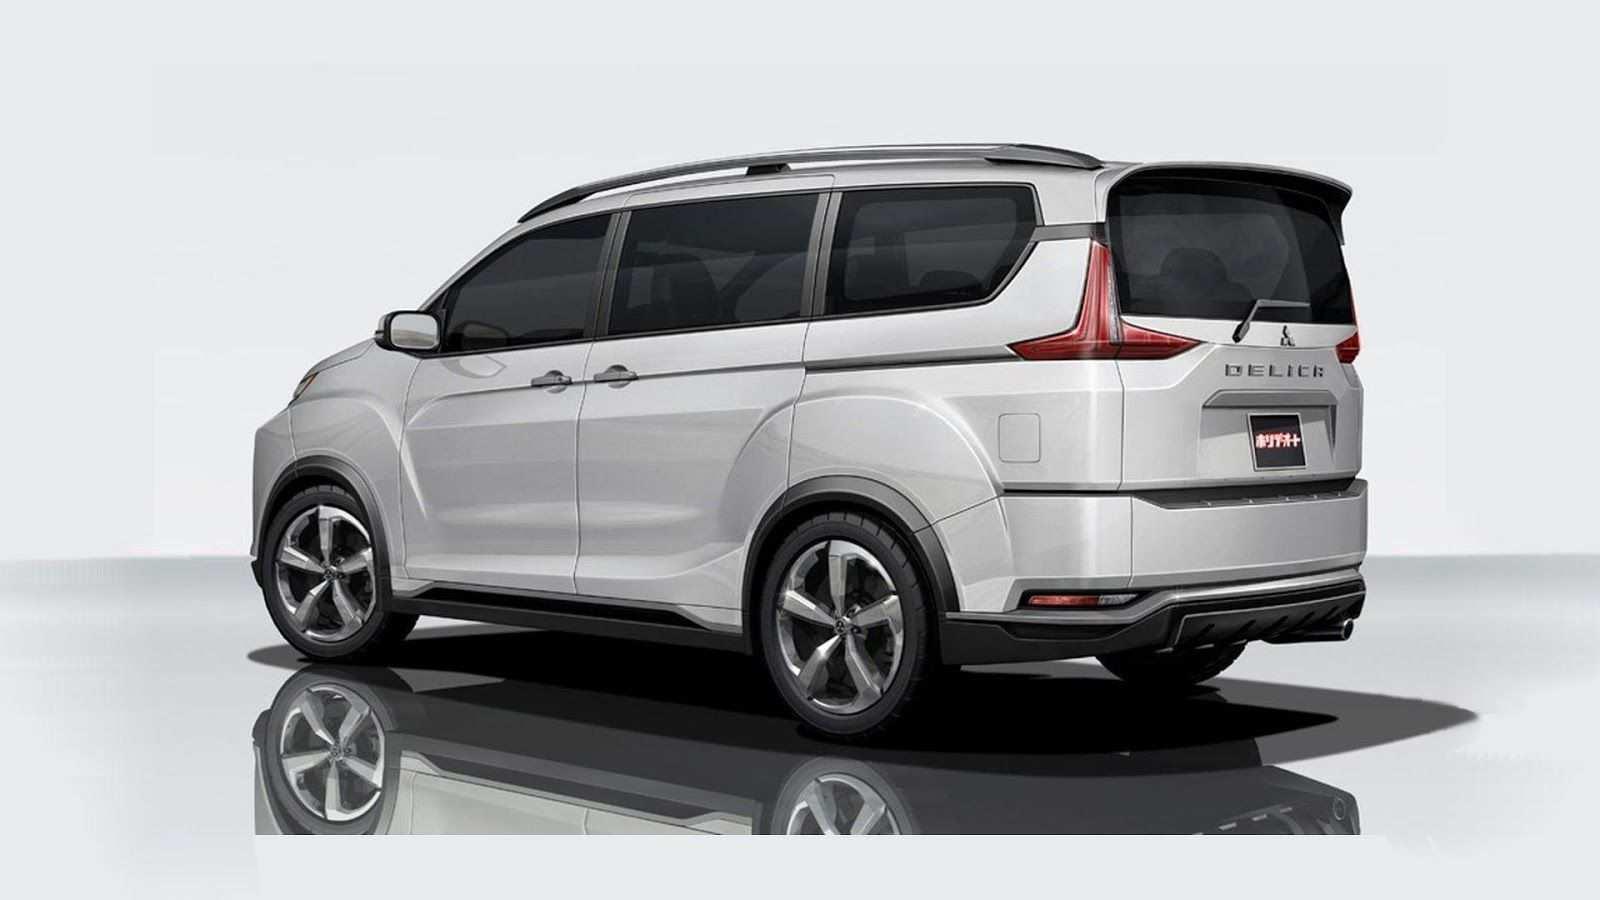 91 All New 2019 Mitsubishi Concept Spesification for 2019 Mitsubishi Concept